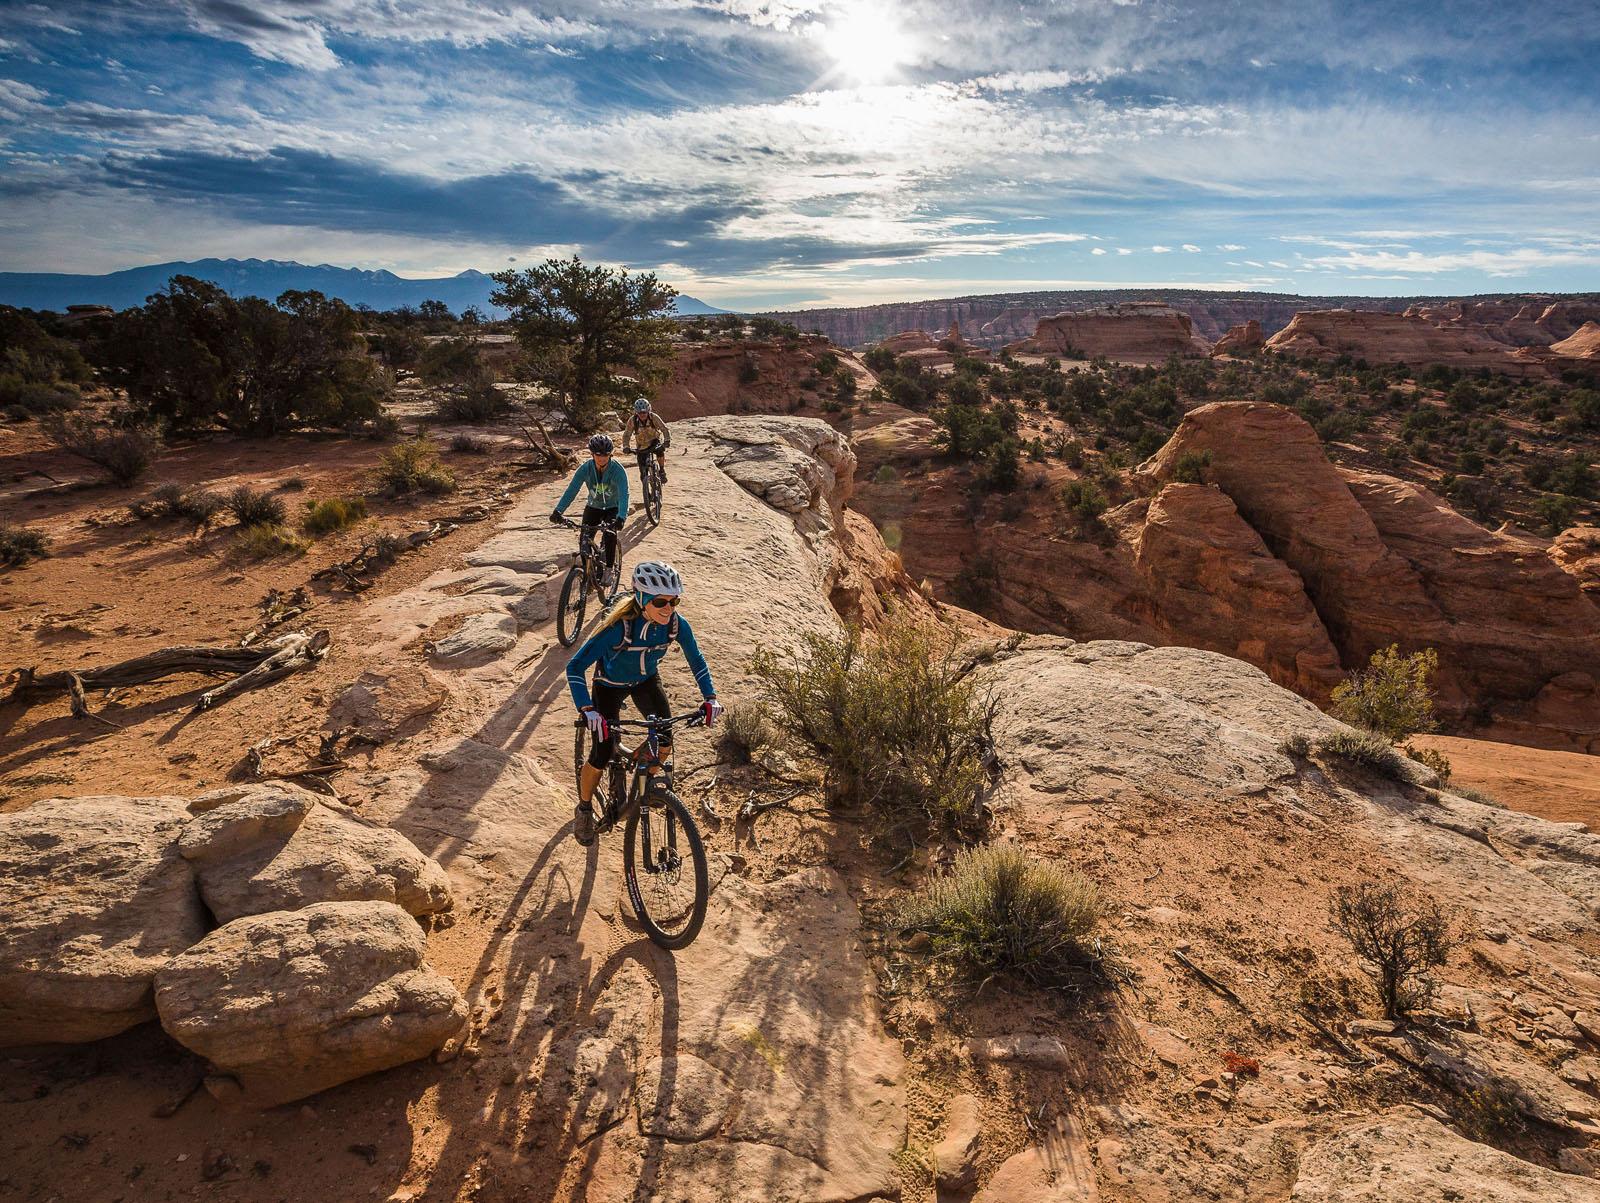 Biking Moab, Slick Rock Trails